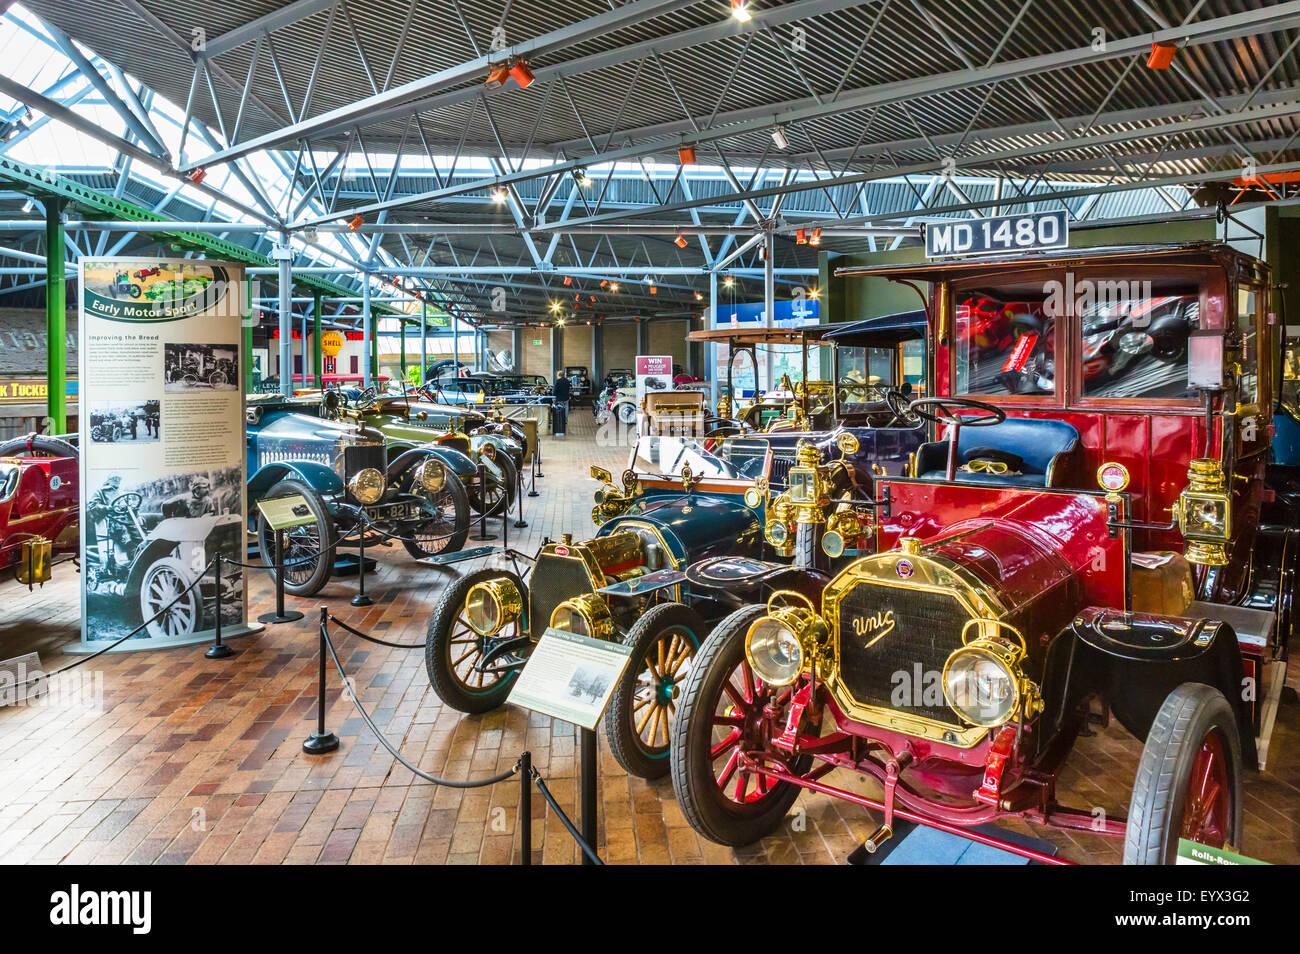 Das National Motor Museum in Beaulieu, Hampshire, England UK Stockbild